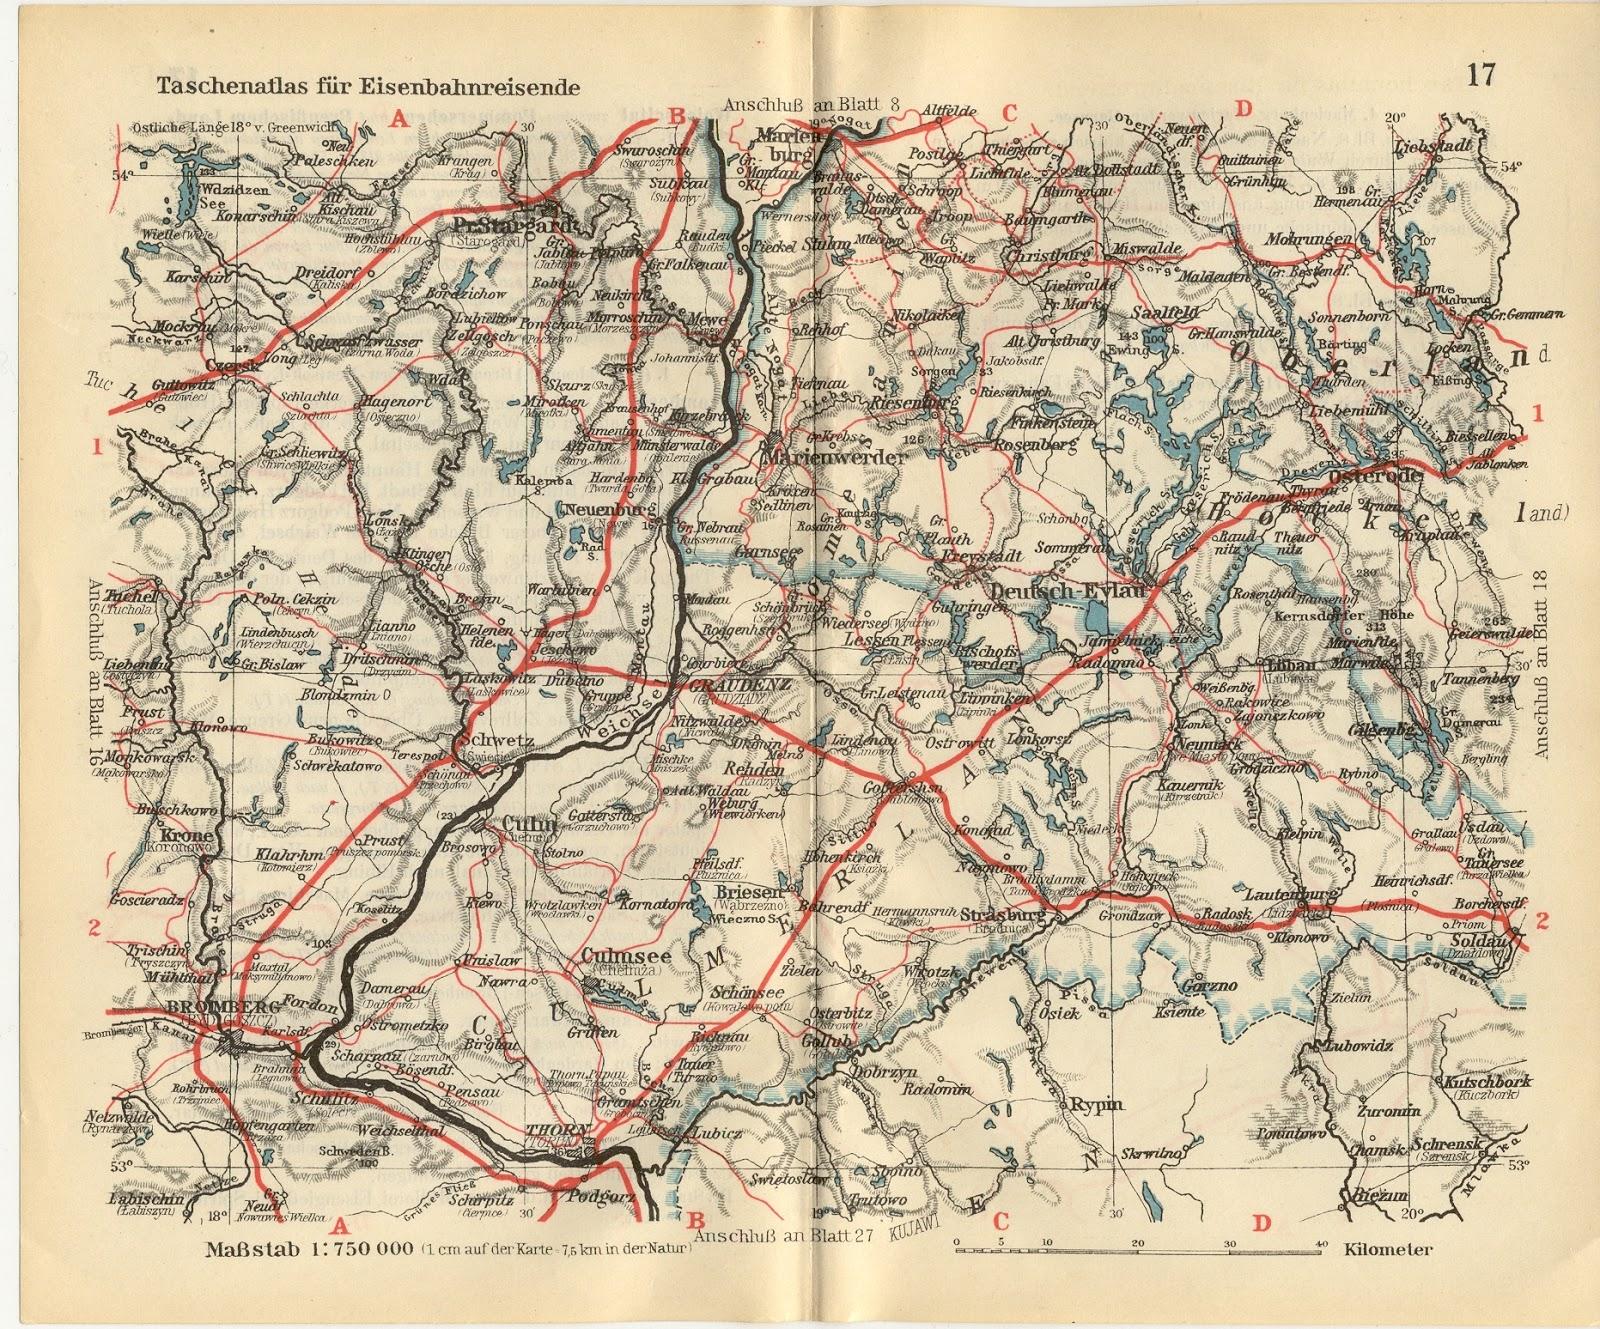 Eisenbahnkarte Culmsee Taschenatlas (pocket atlas) 1925